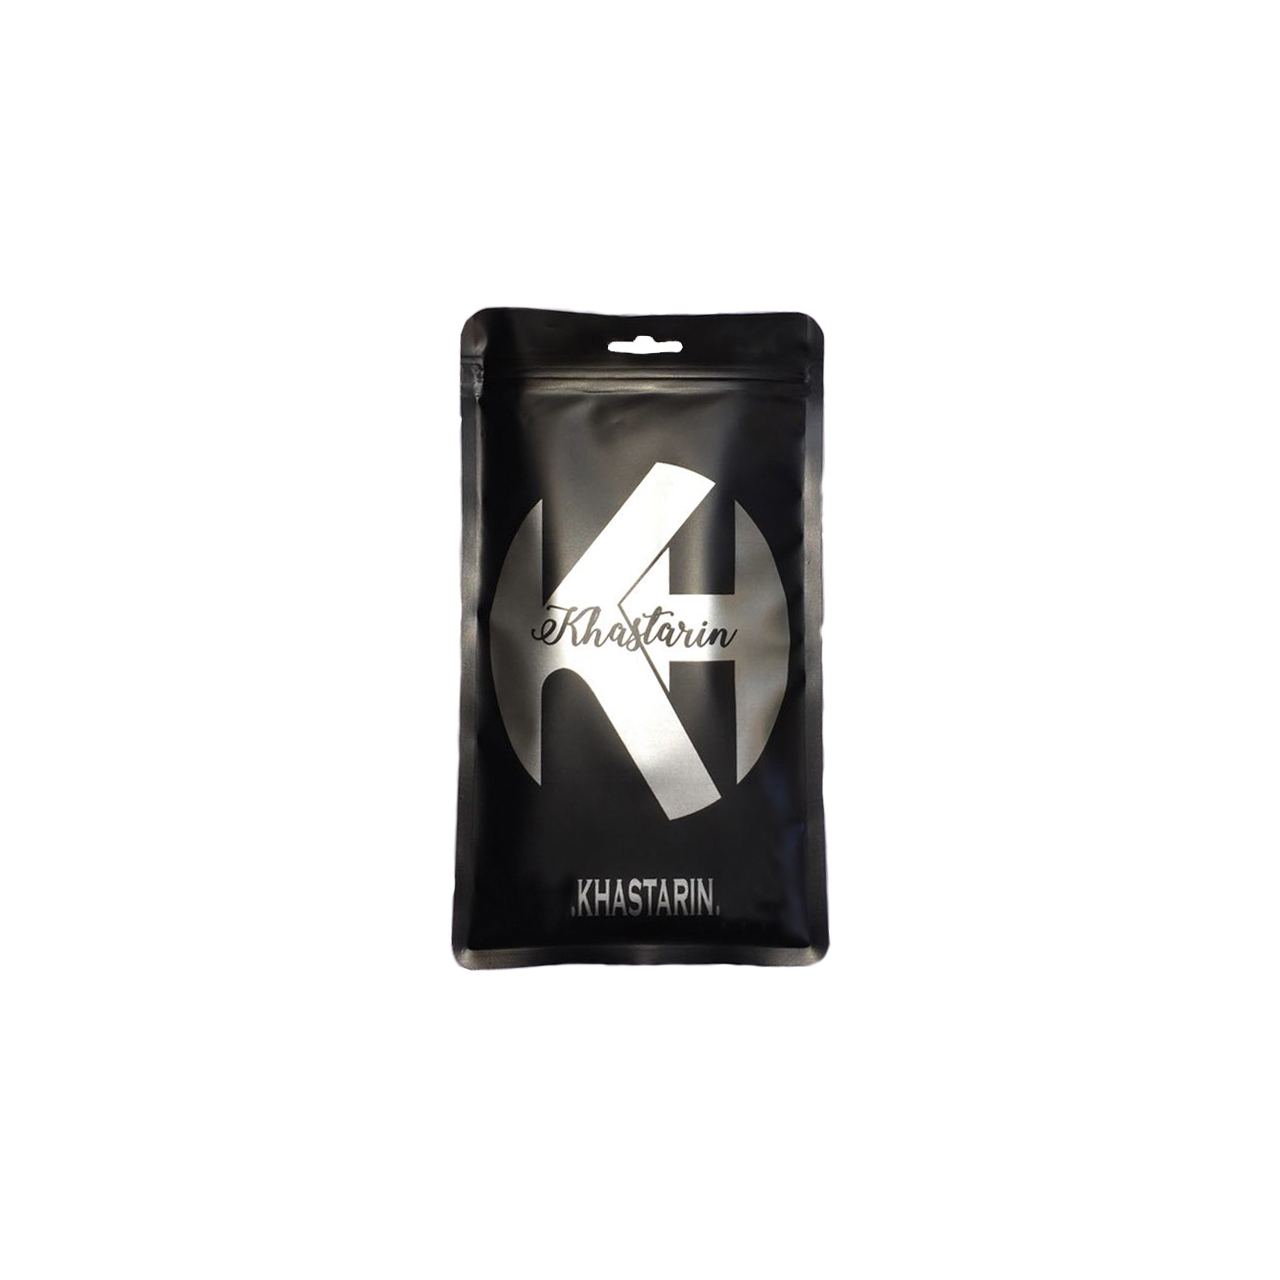 کاور کی اچ کد C20 مناسب برای گوشی موبایل سامسونگ galaxy J510 / J5 2016